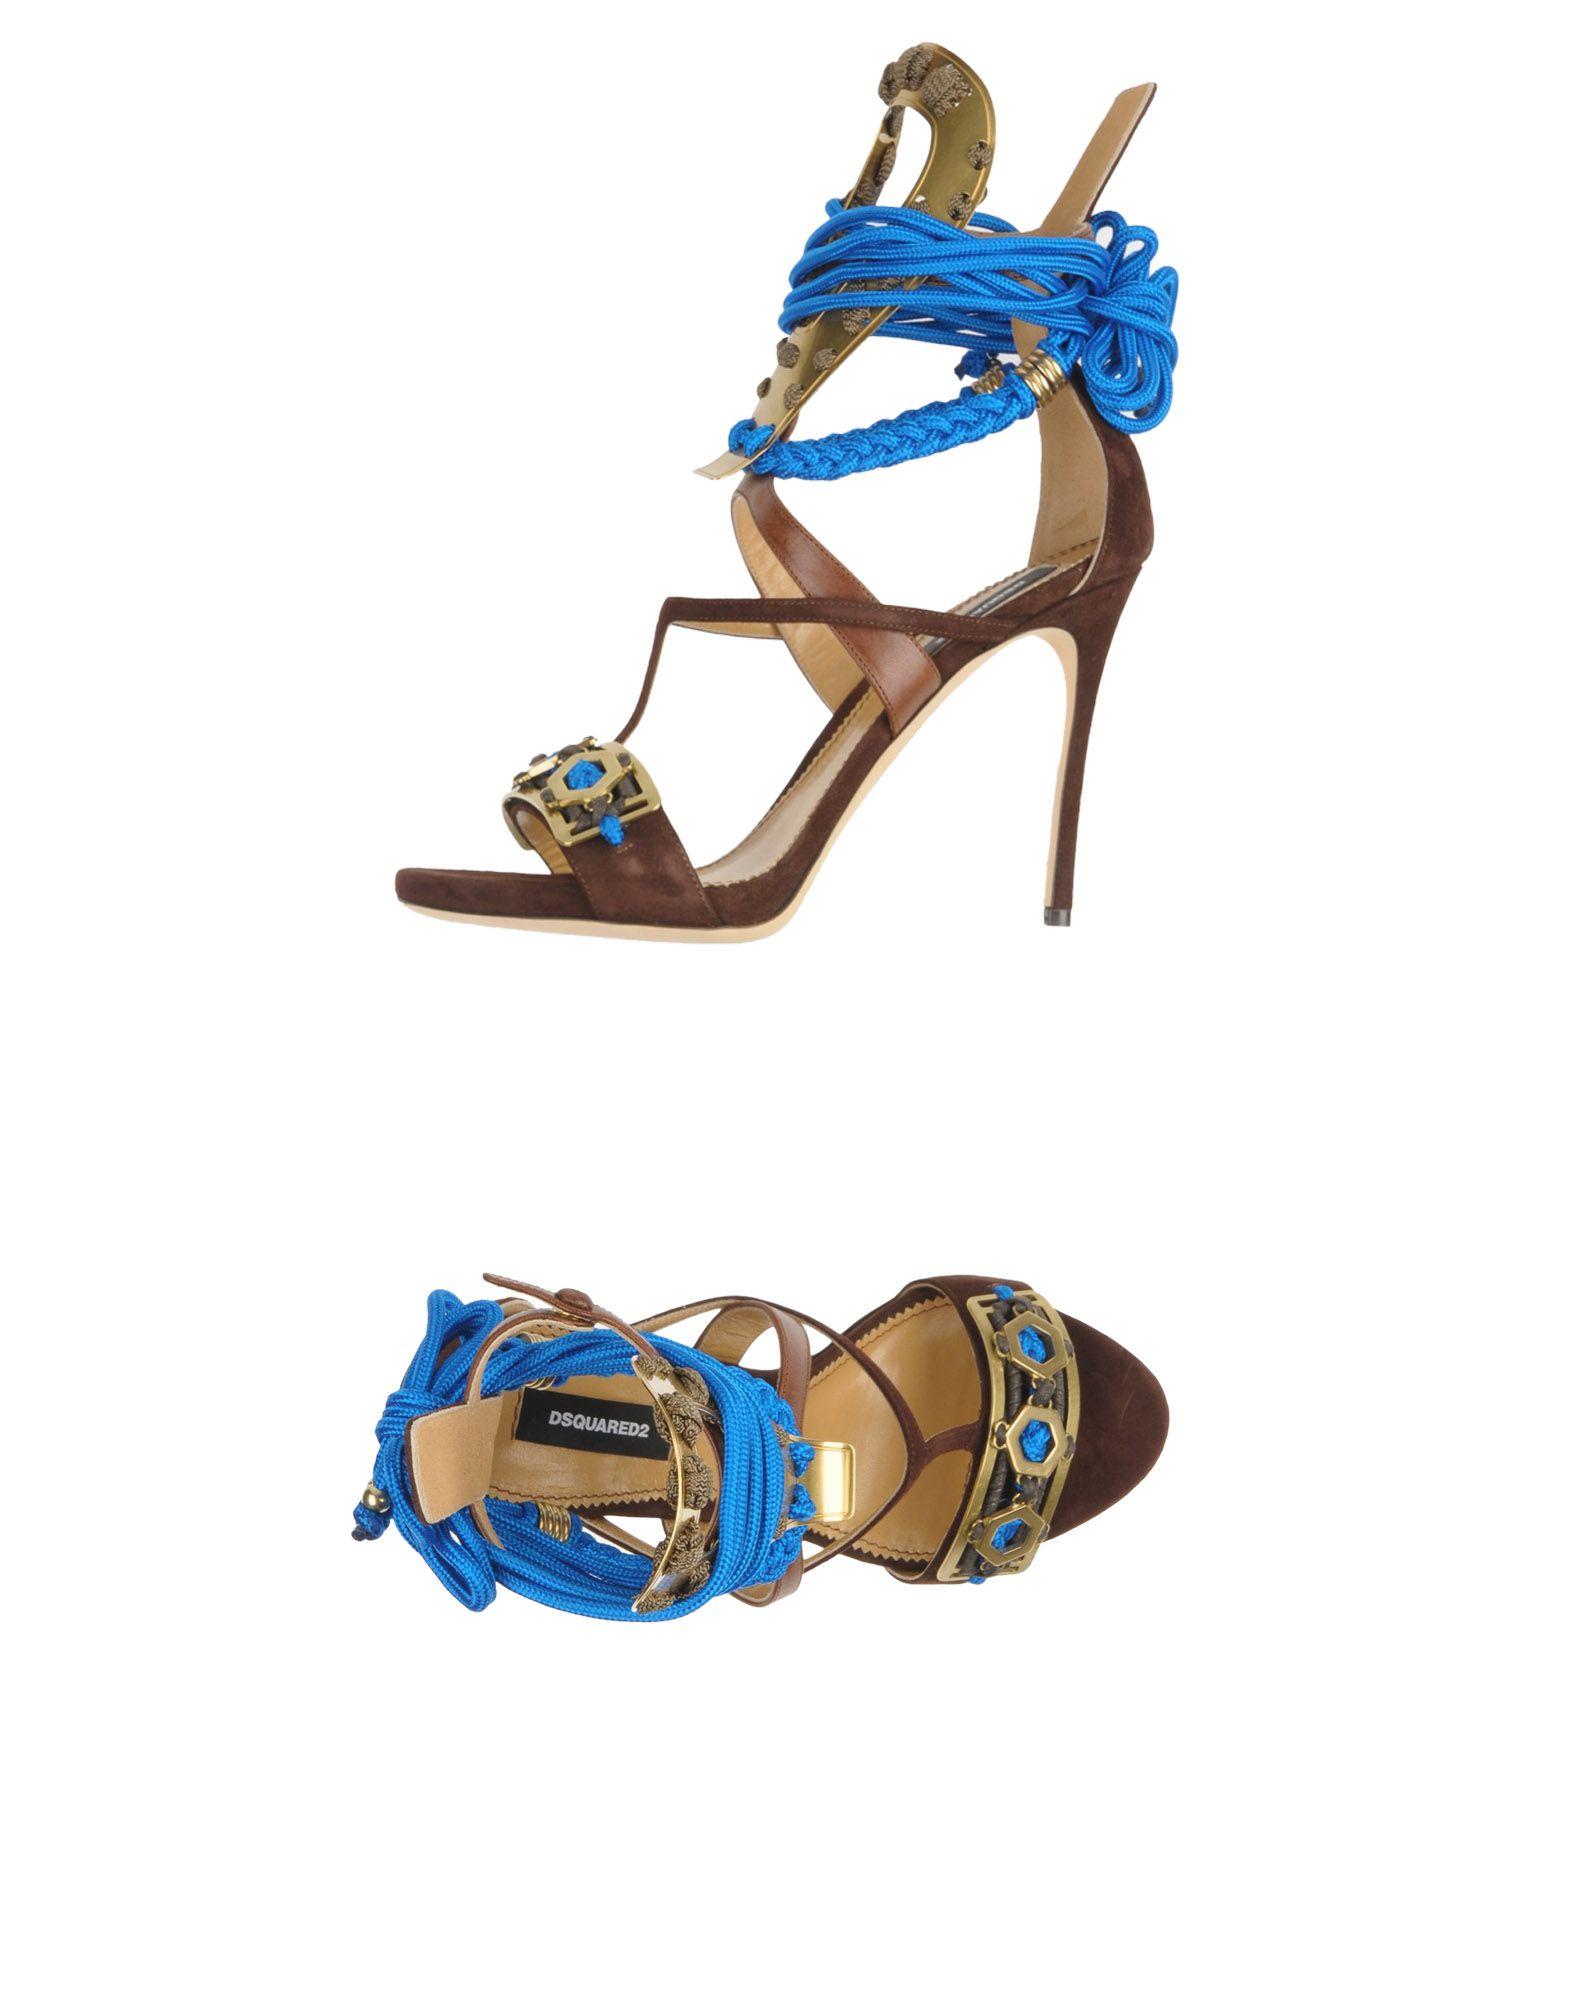 Dsquared2 Sandalen Damen gut  11298651TGGünstige gut Damen aussehende Schuhe 7f34df